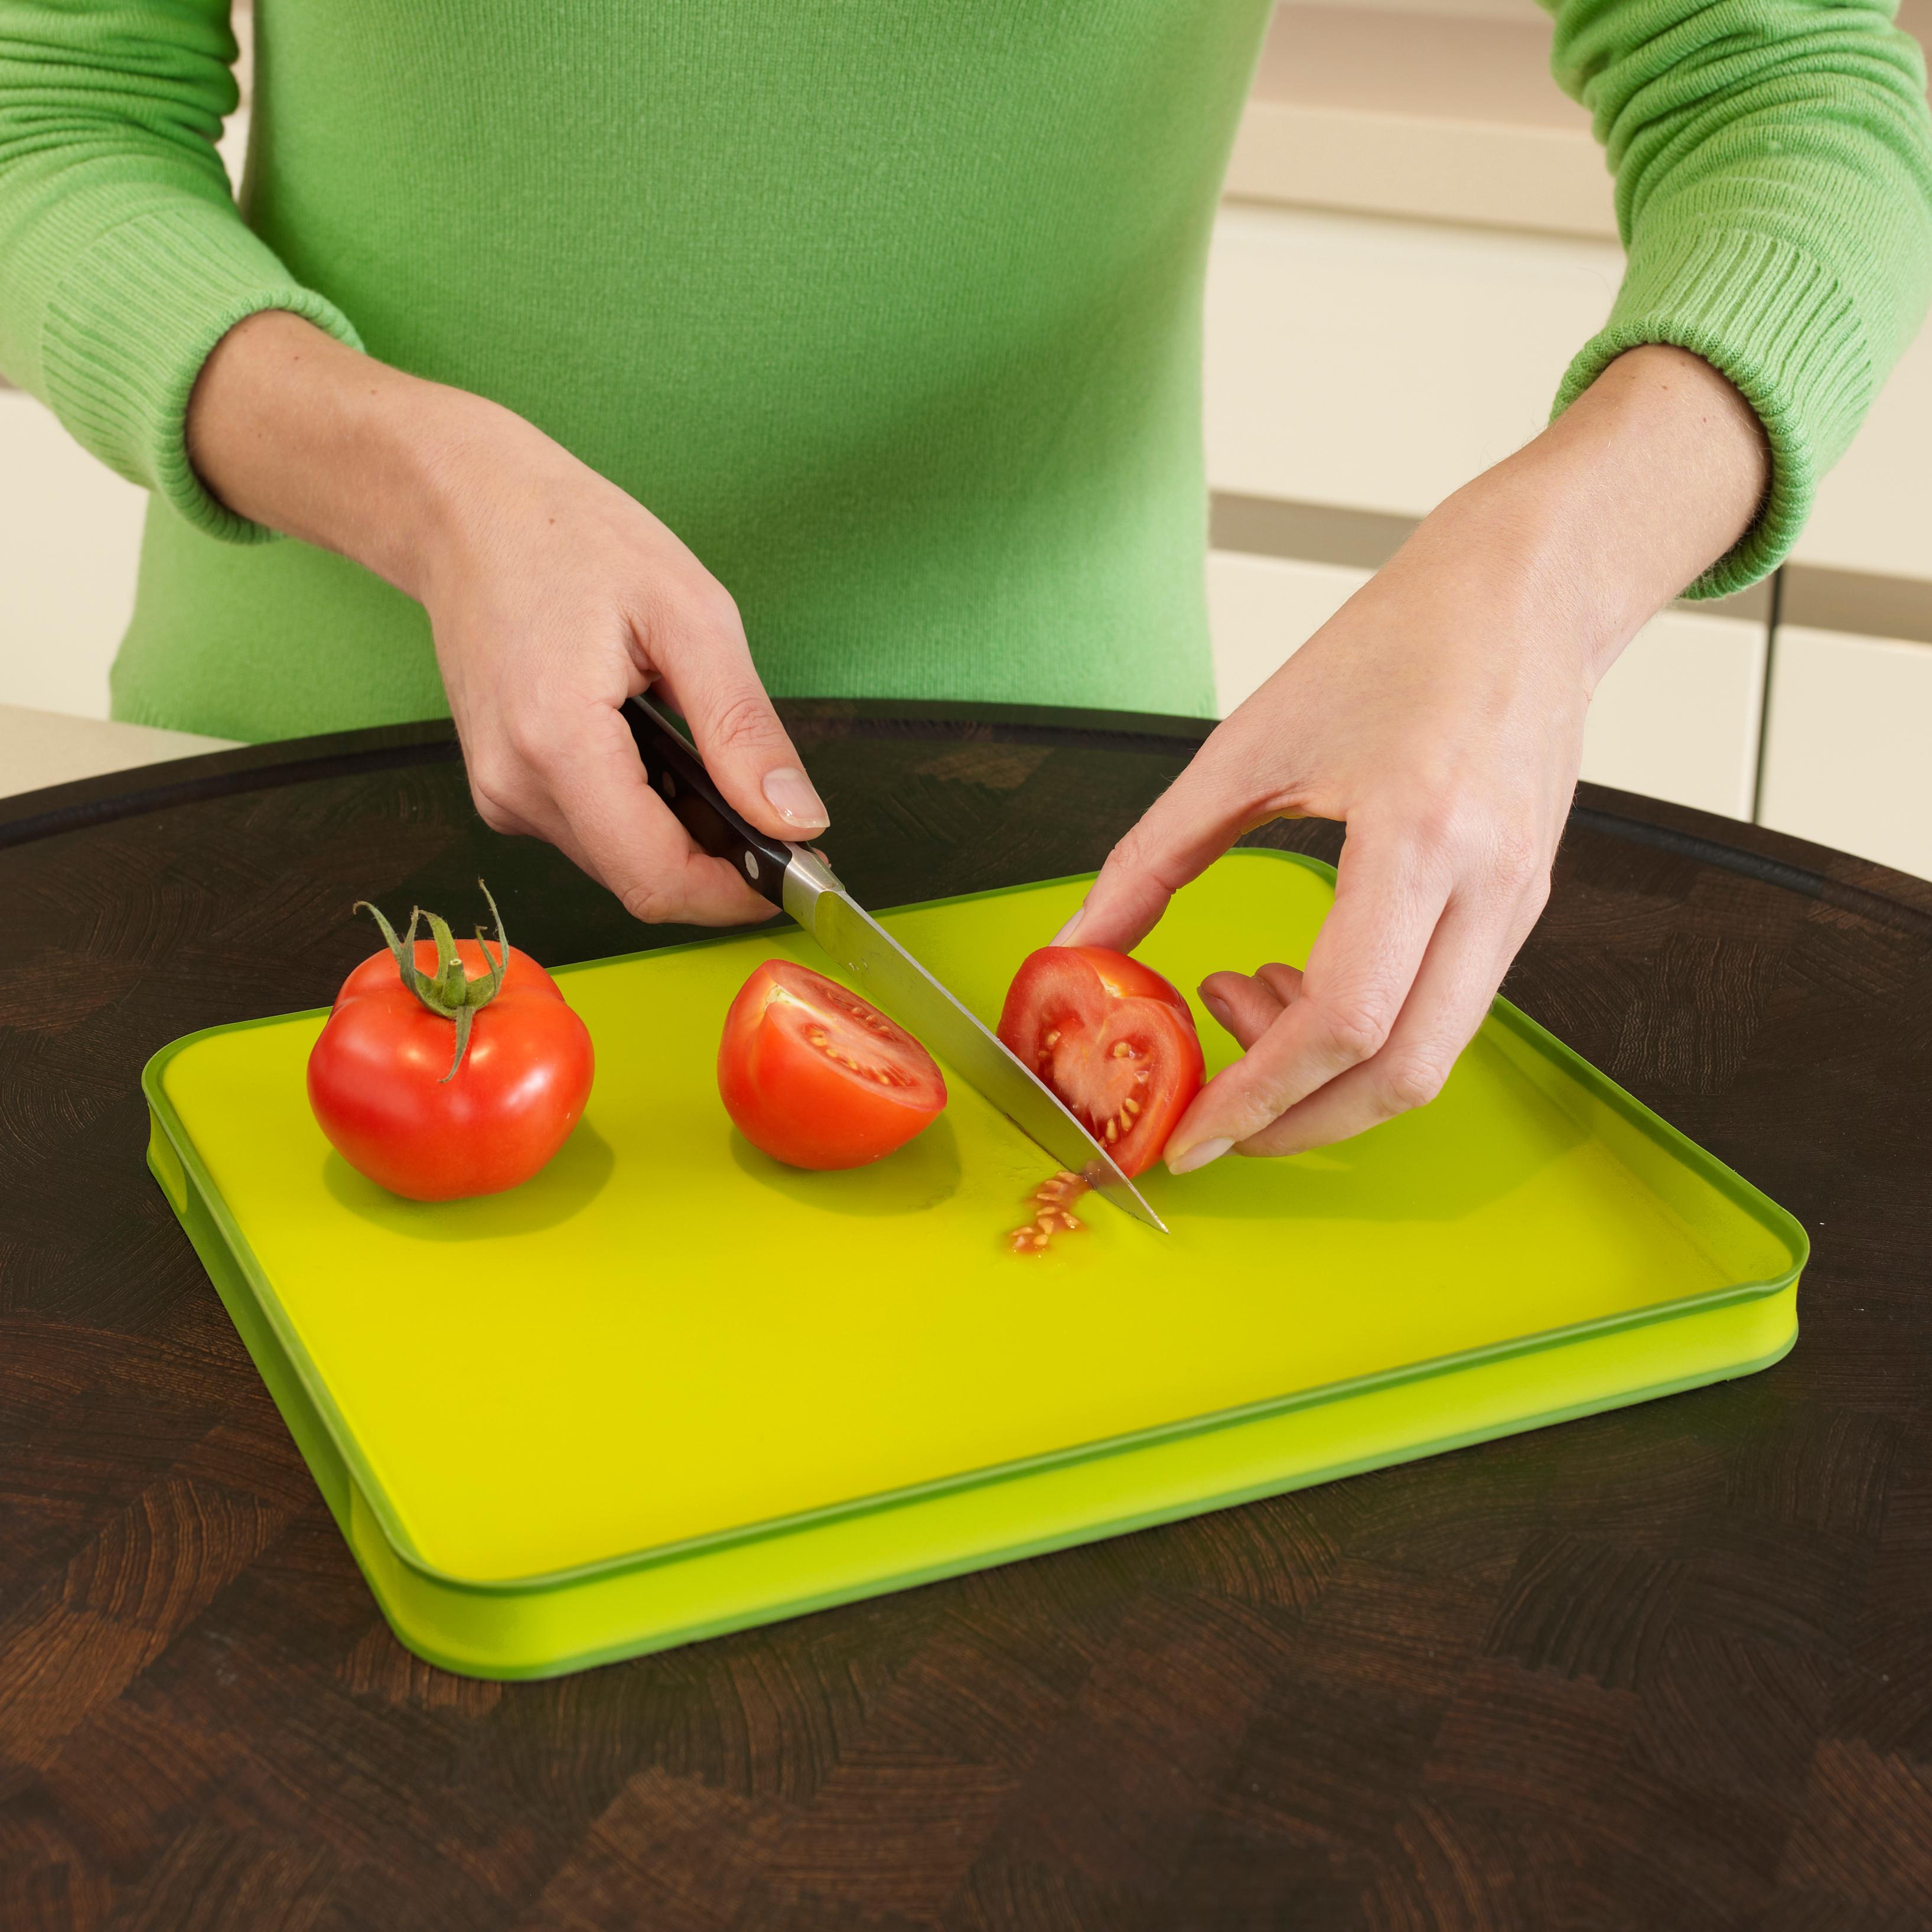 Joseph Joseph Cut and Carve Plus Green Chopping Board